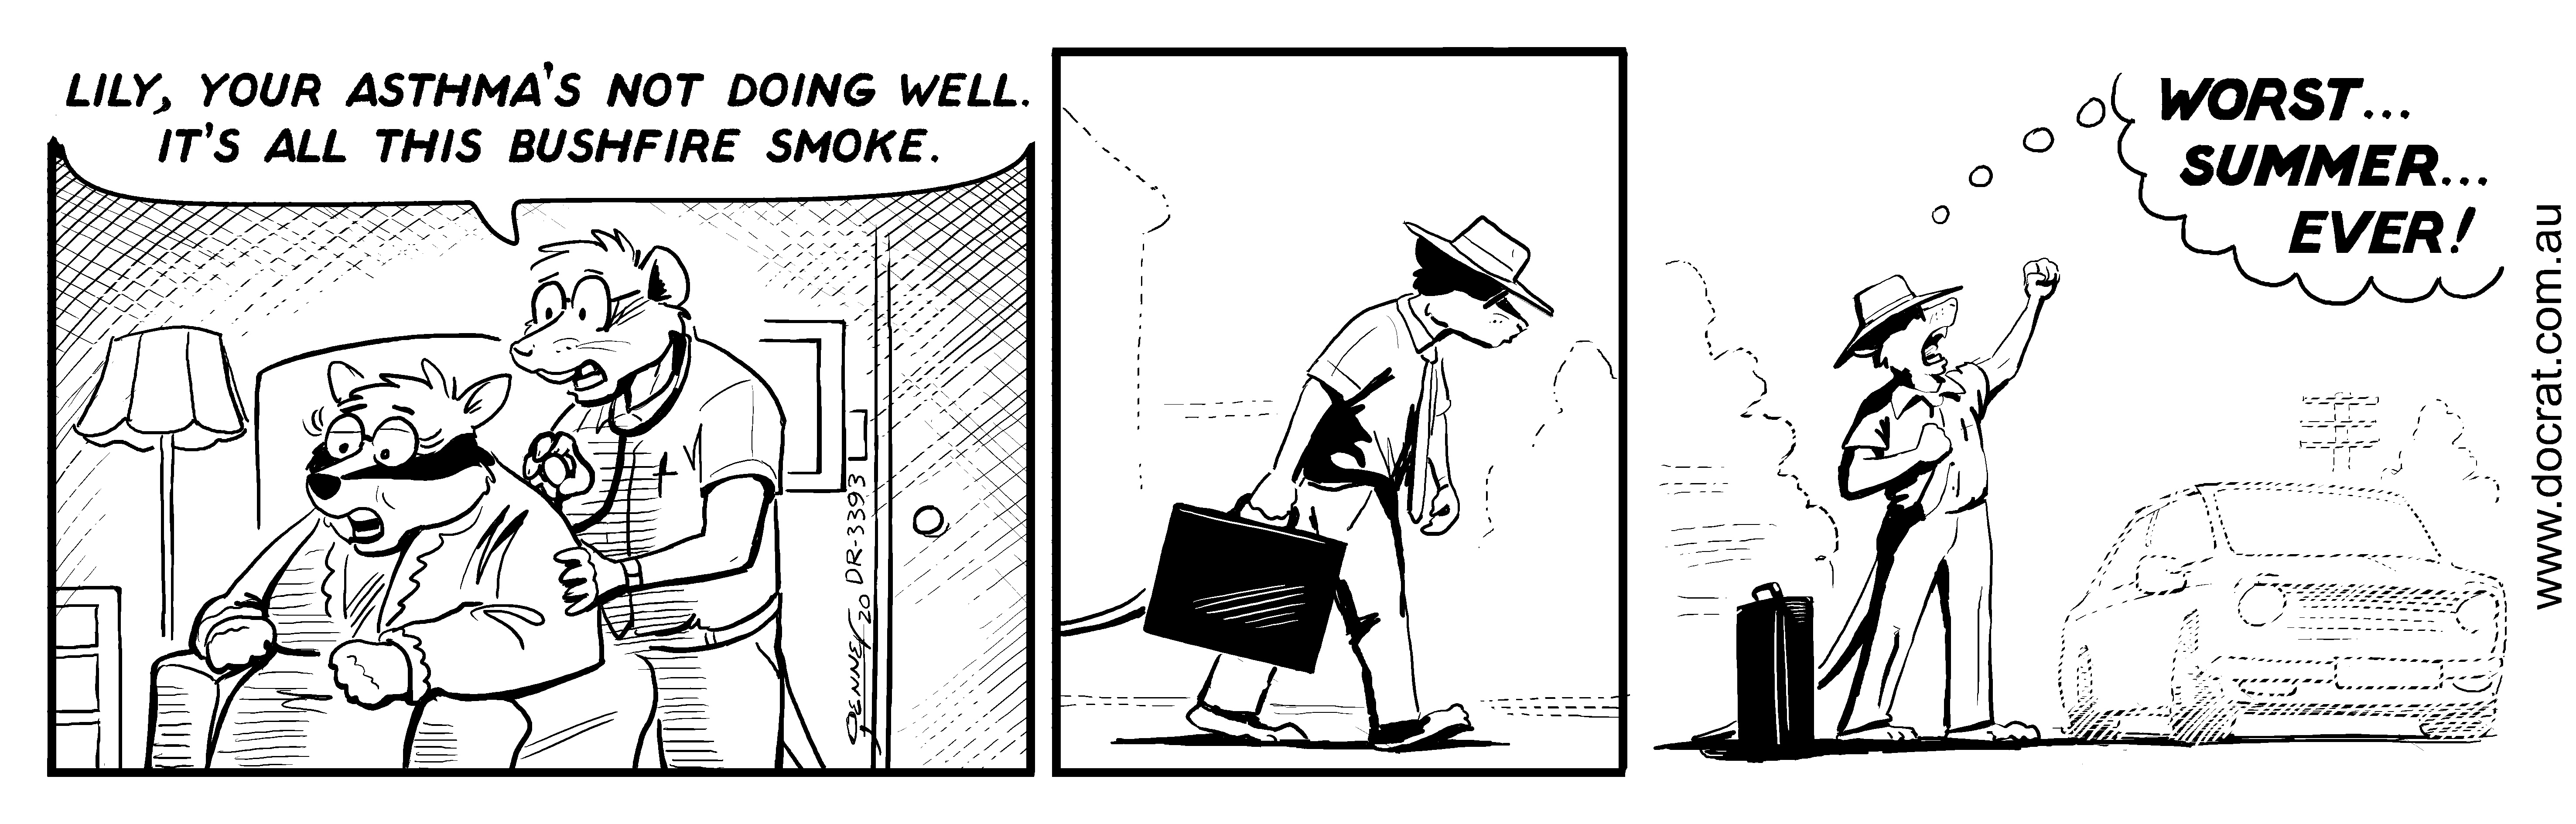 20200115